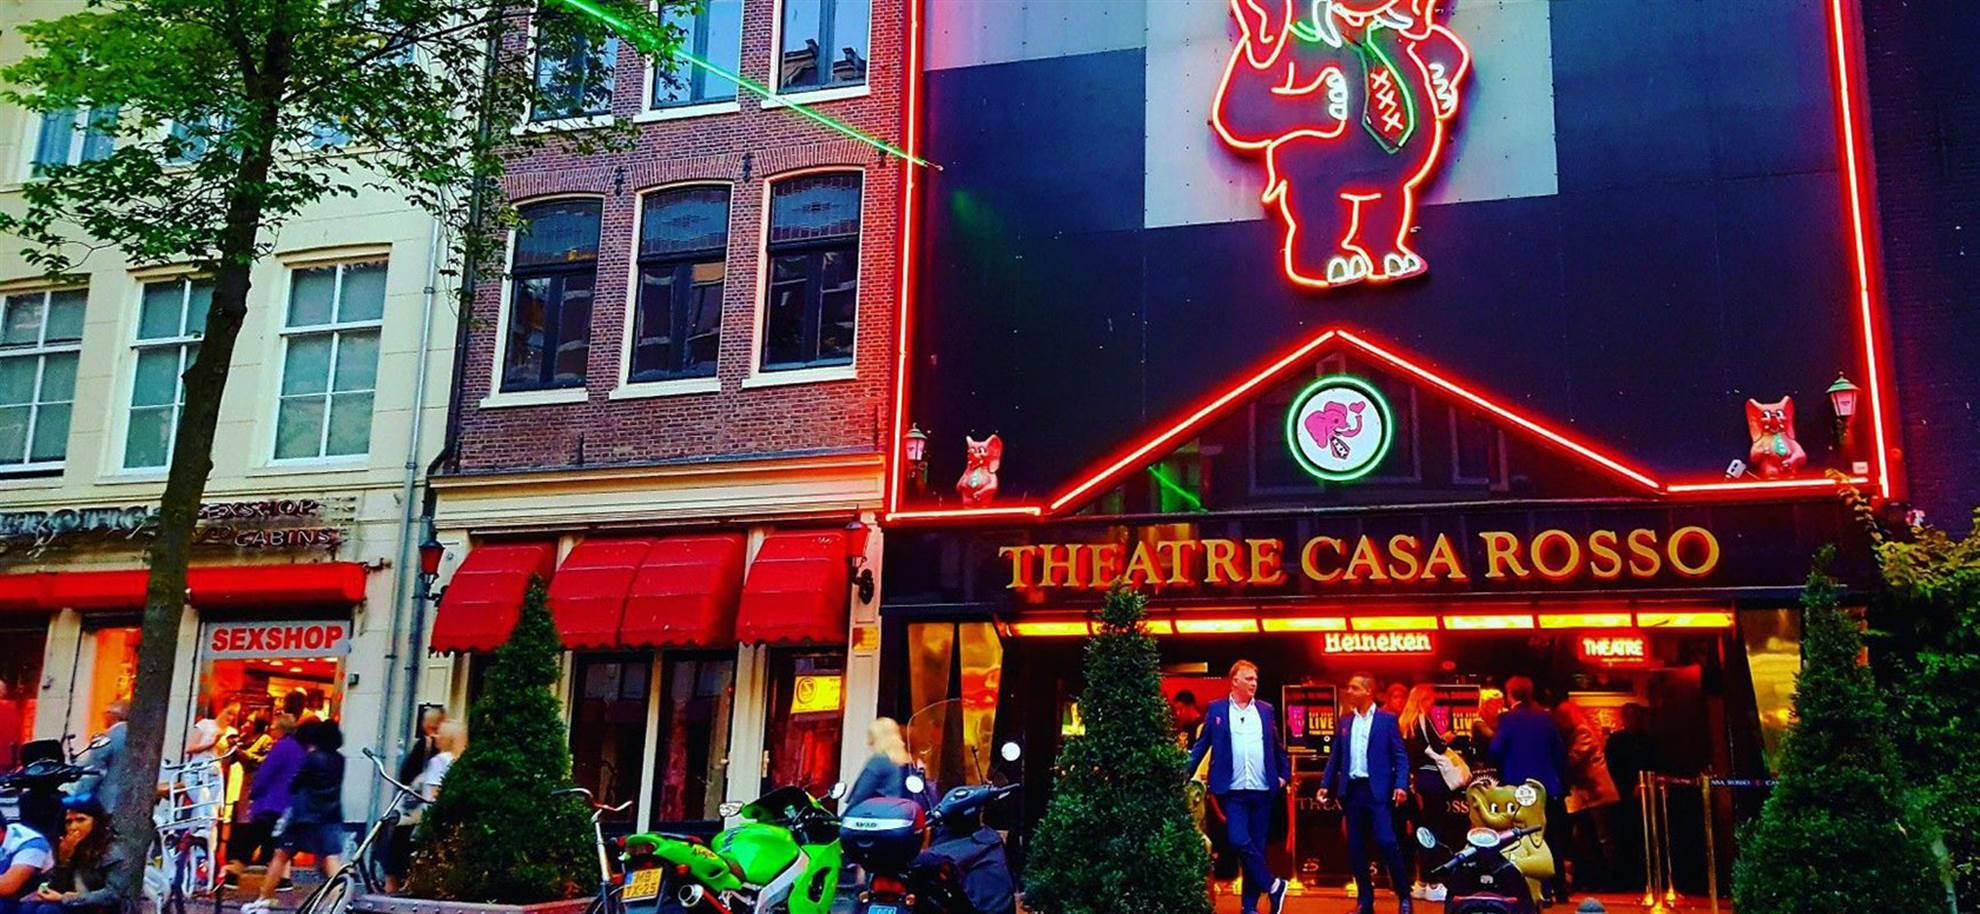 Casa Rosso Erotiek Theater